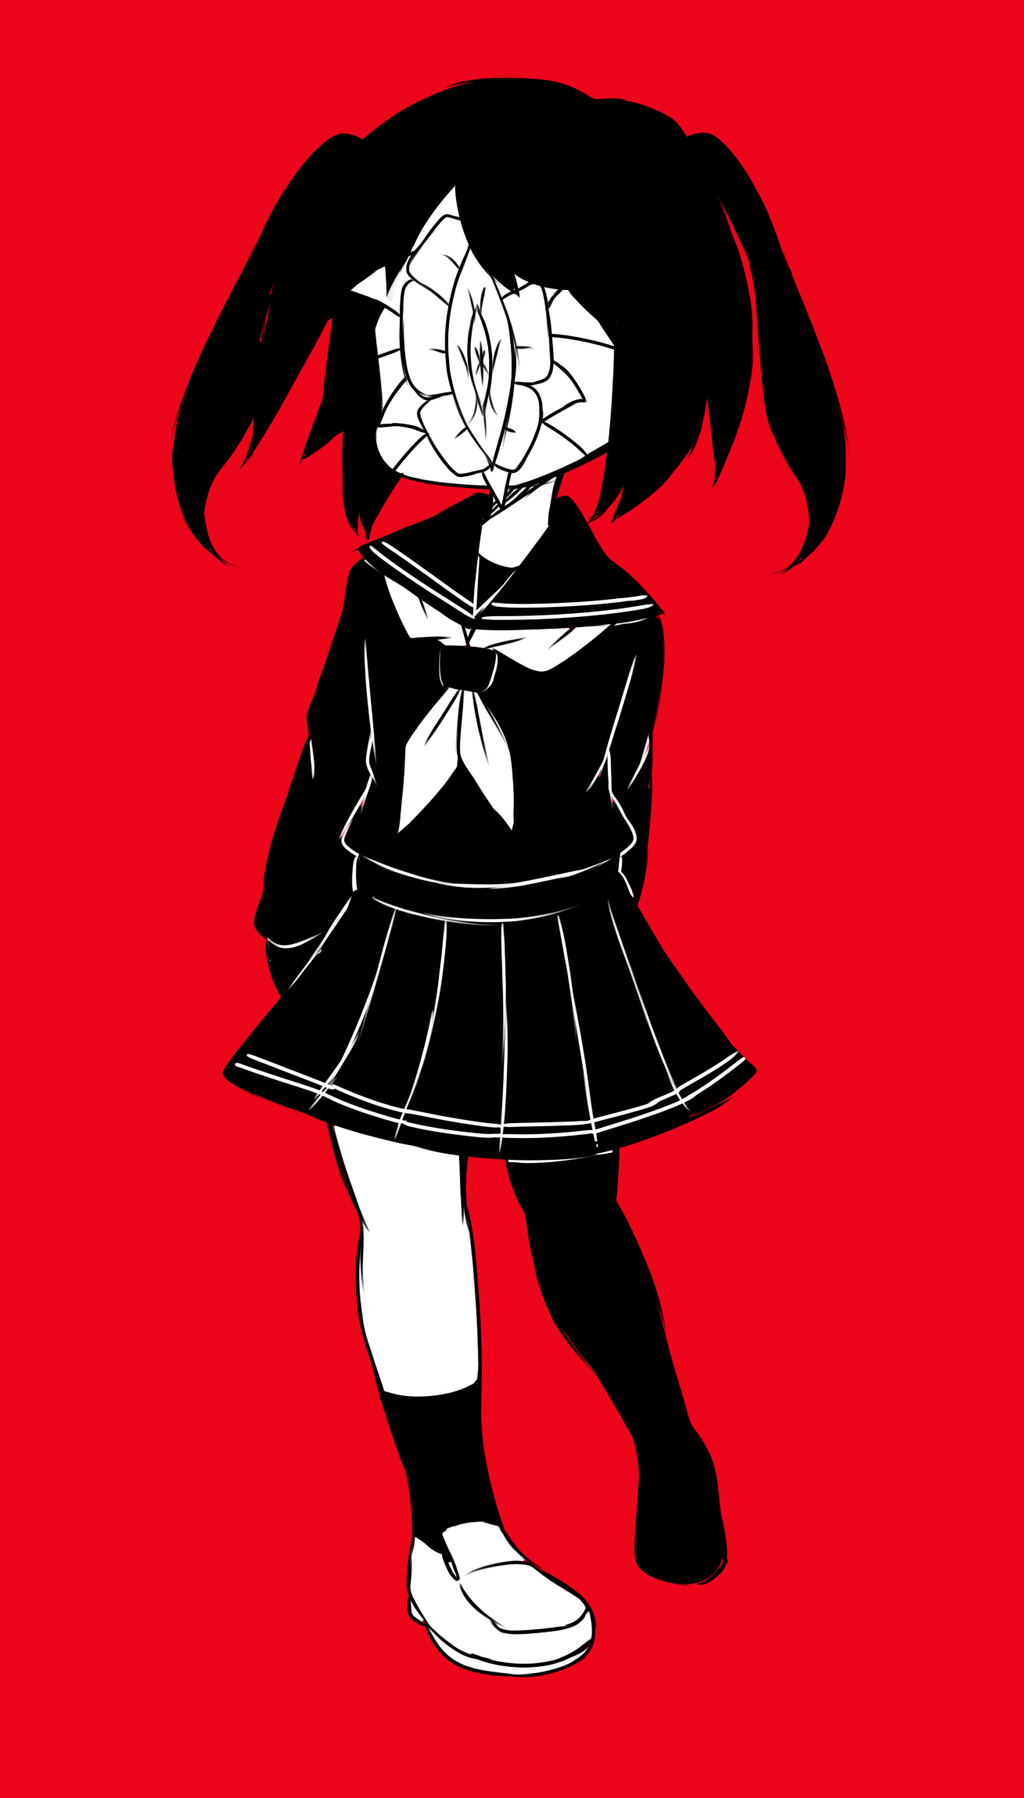 [Funtoshi City Girl] Little Miss Monster girl by OusatsuZansatsu